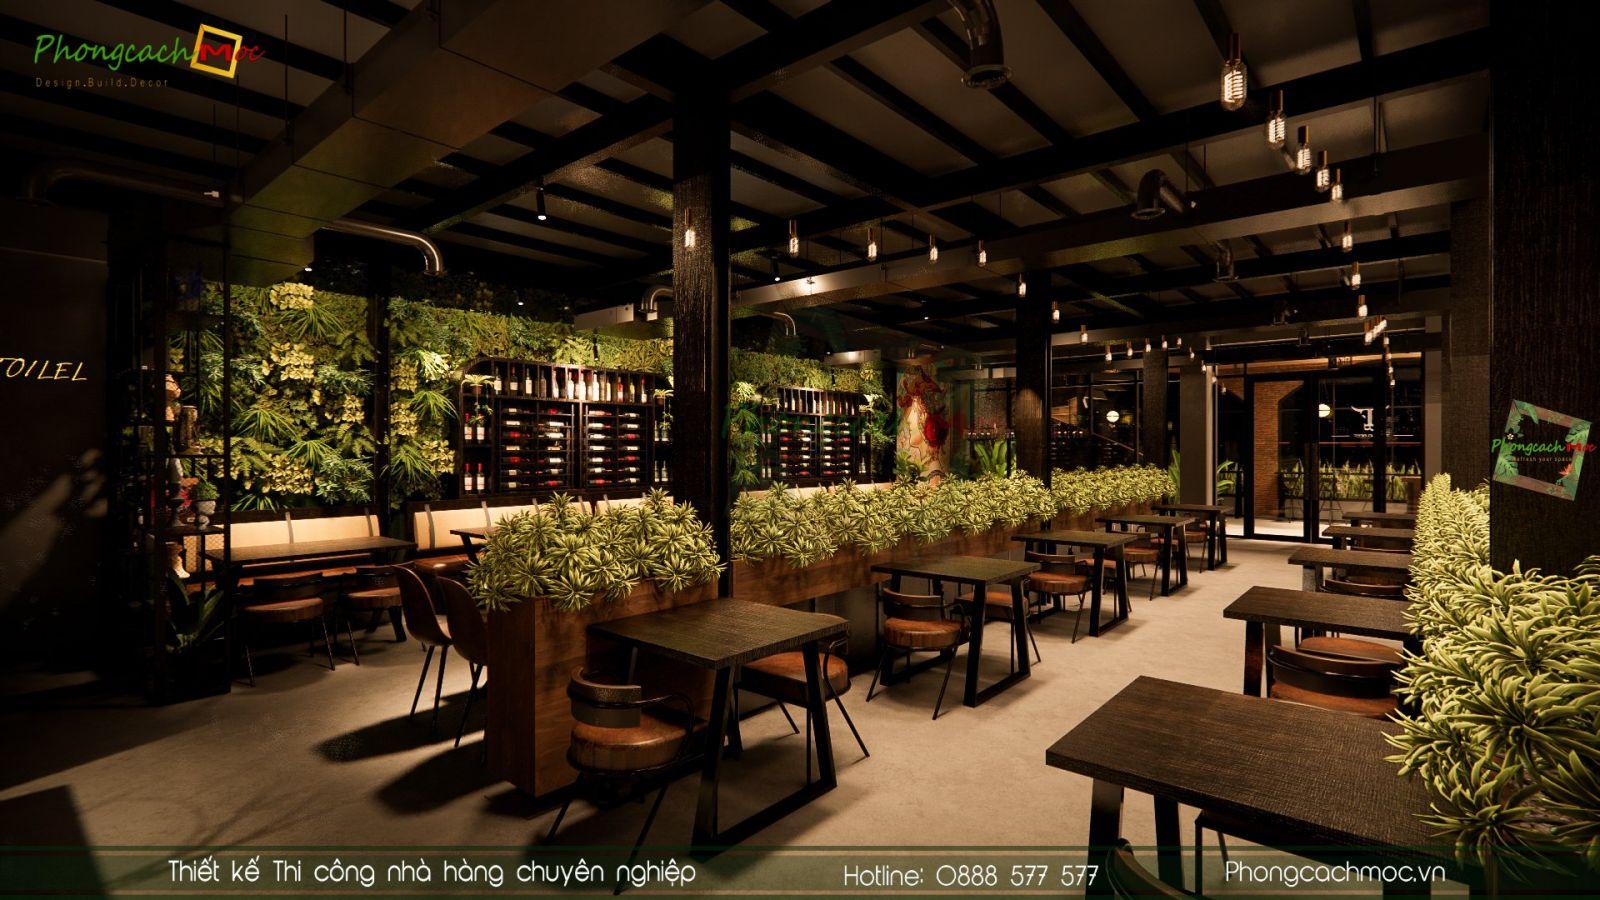 Thiet-ke-Nha-hang-The-Topping-Beef-Quan-139